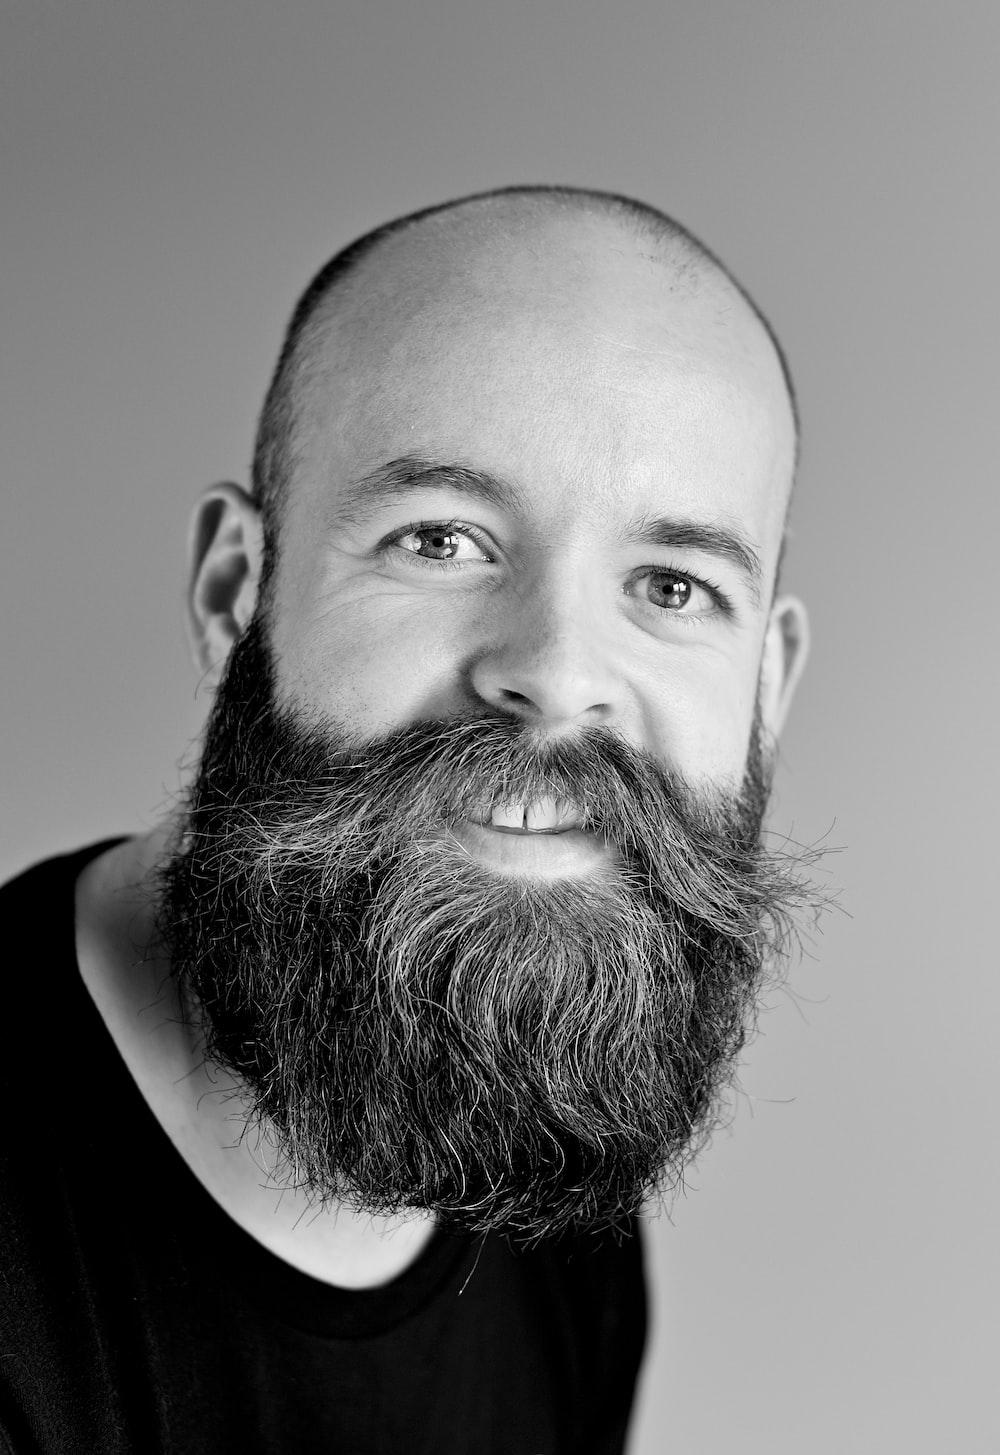 Marvelous Beard Model Pictures Download Free Images On Unsplash Schematic Wiring Diagrams Phreekkolirunnerswayorg